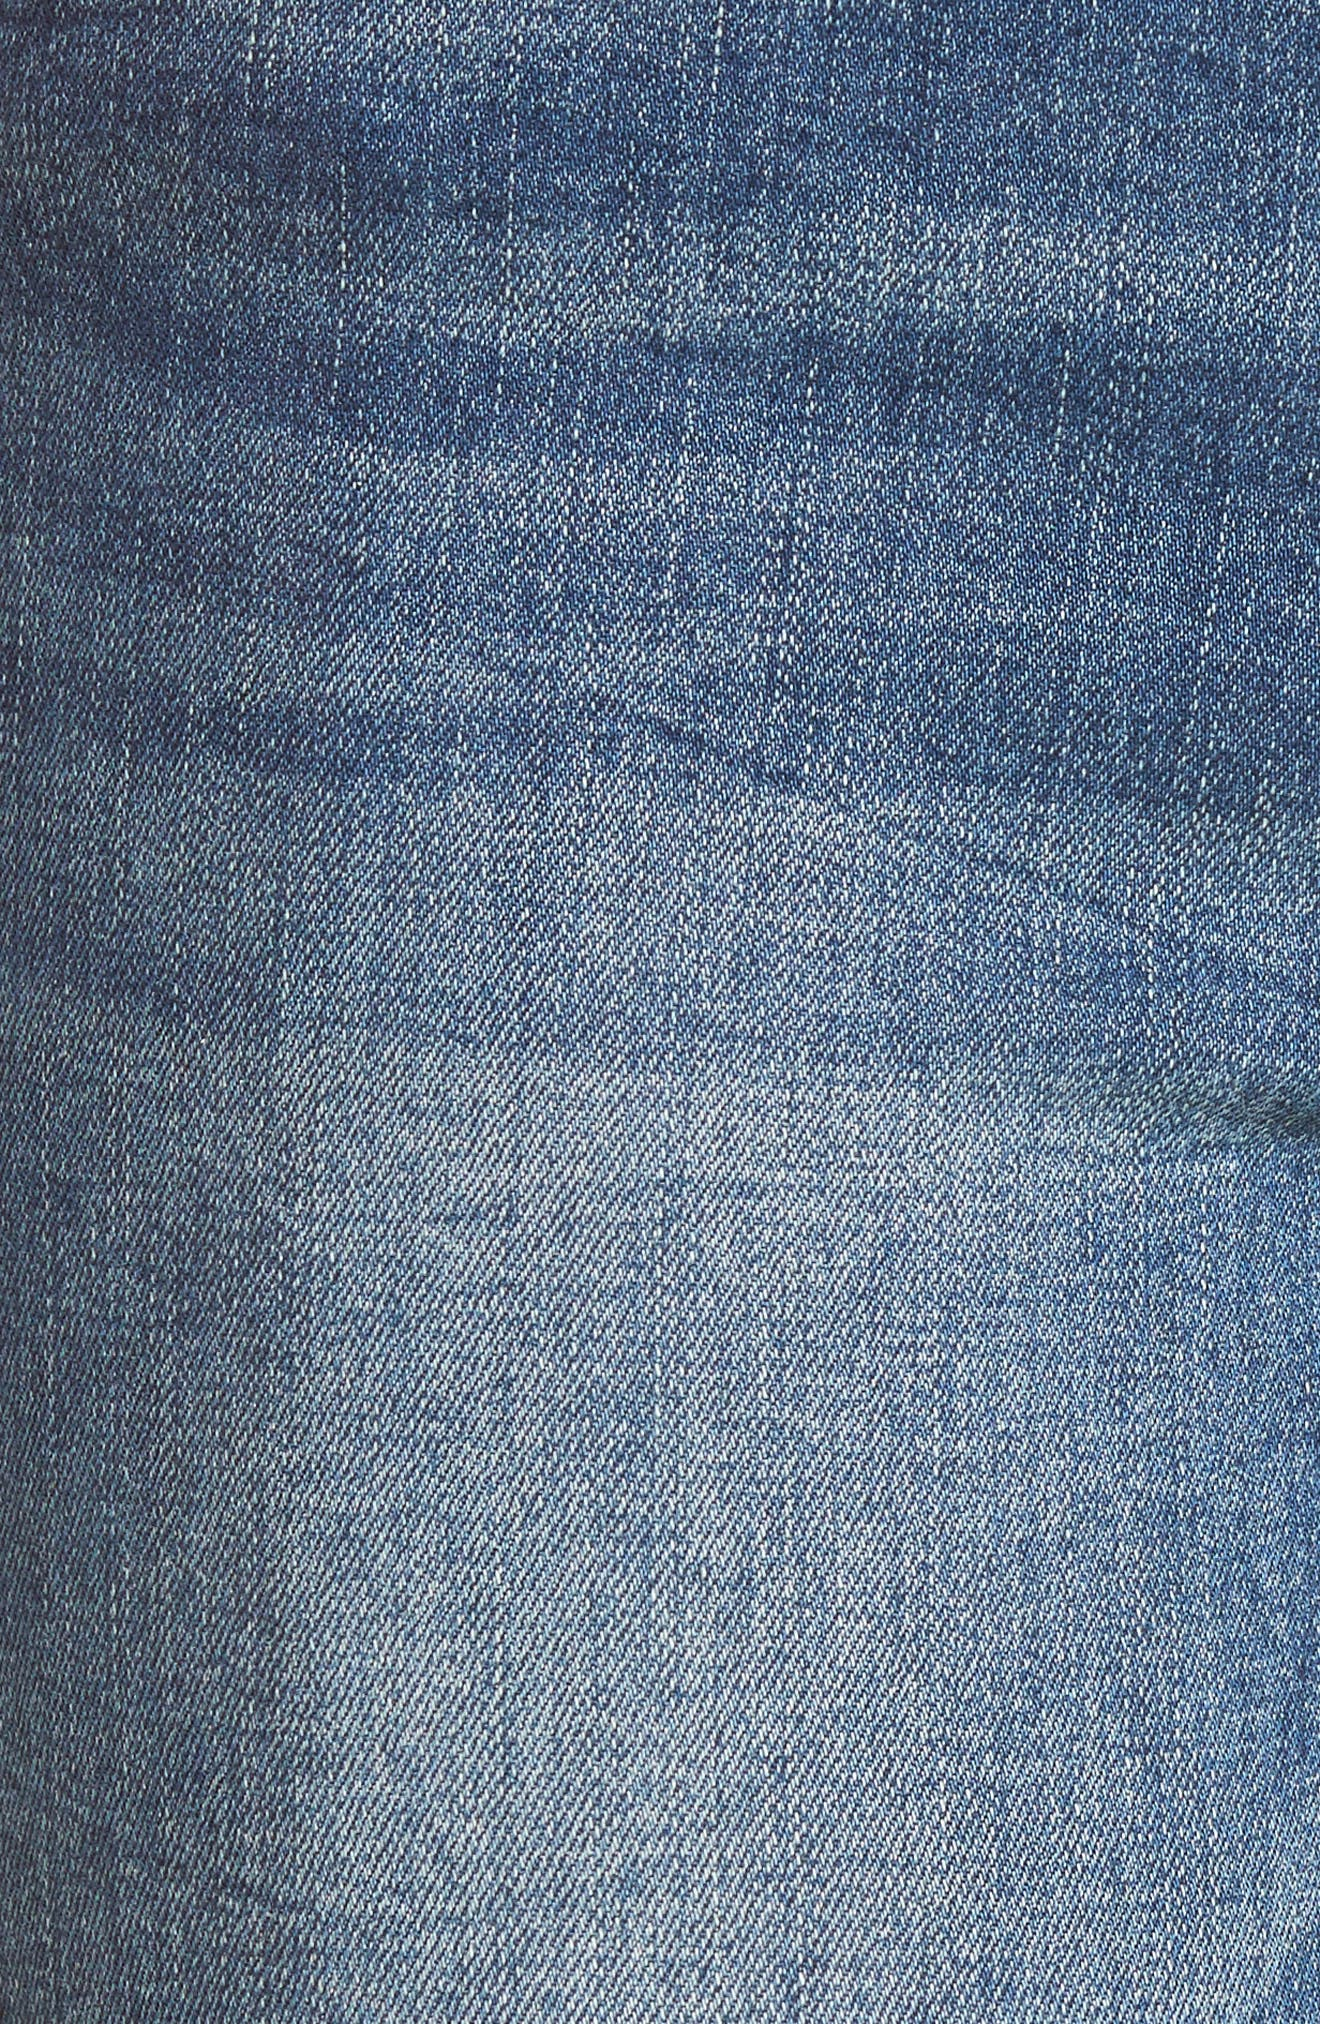 Cry Baby Raw Hem High Waist Skinny Jeans,                             Alternate thumbnail 6, color,                             400